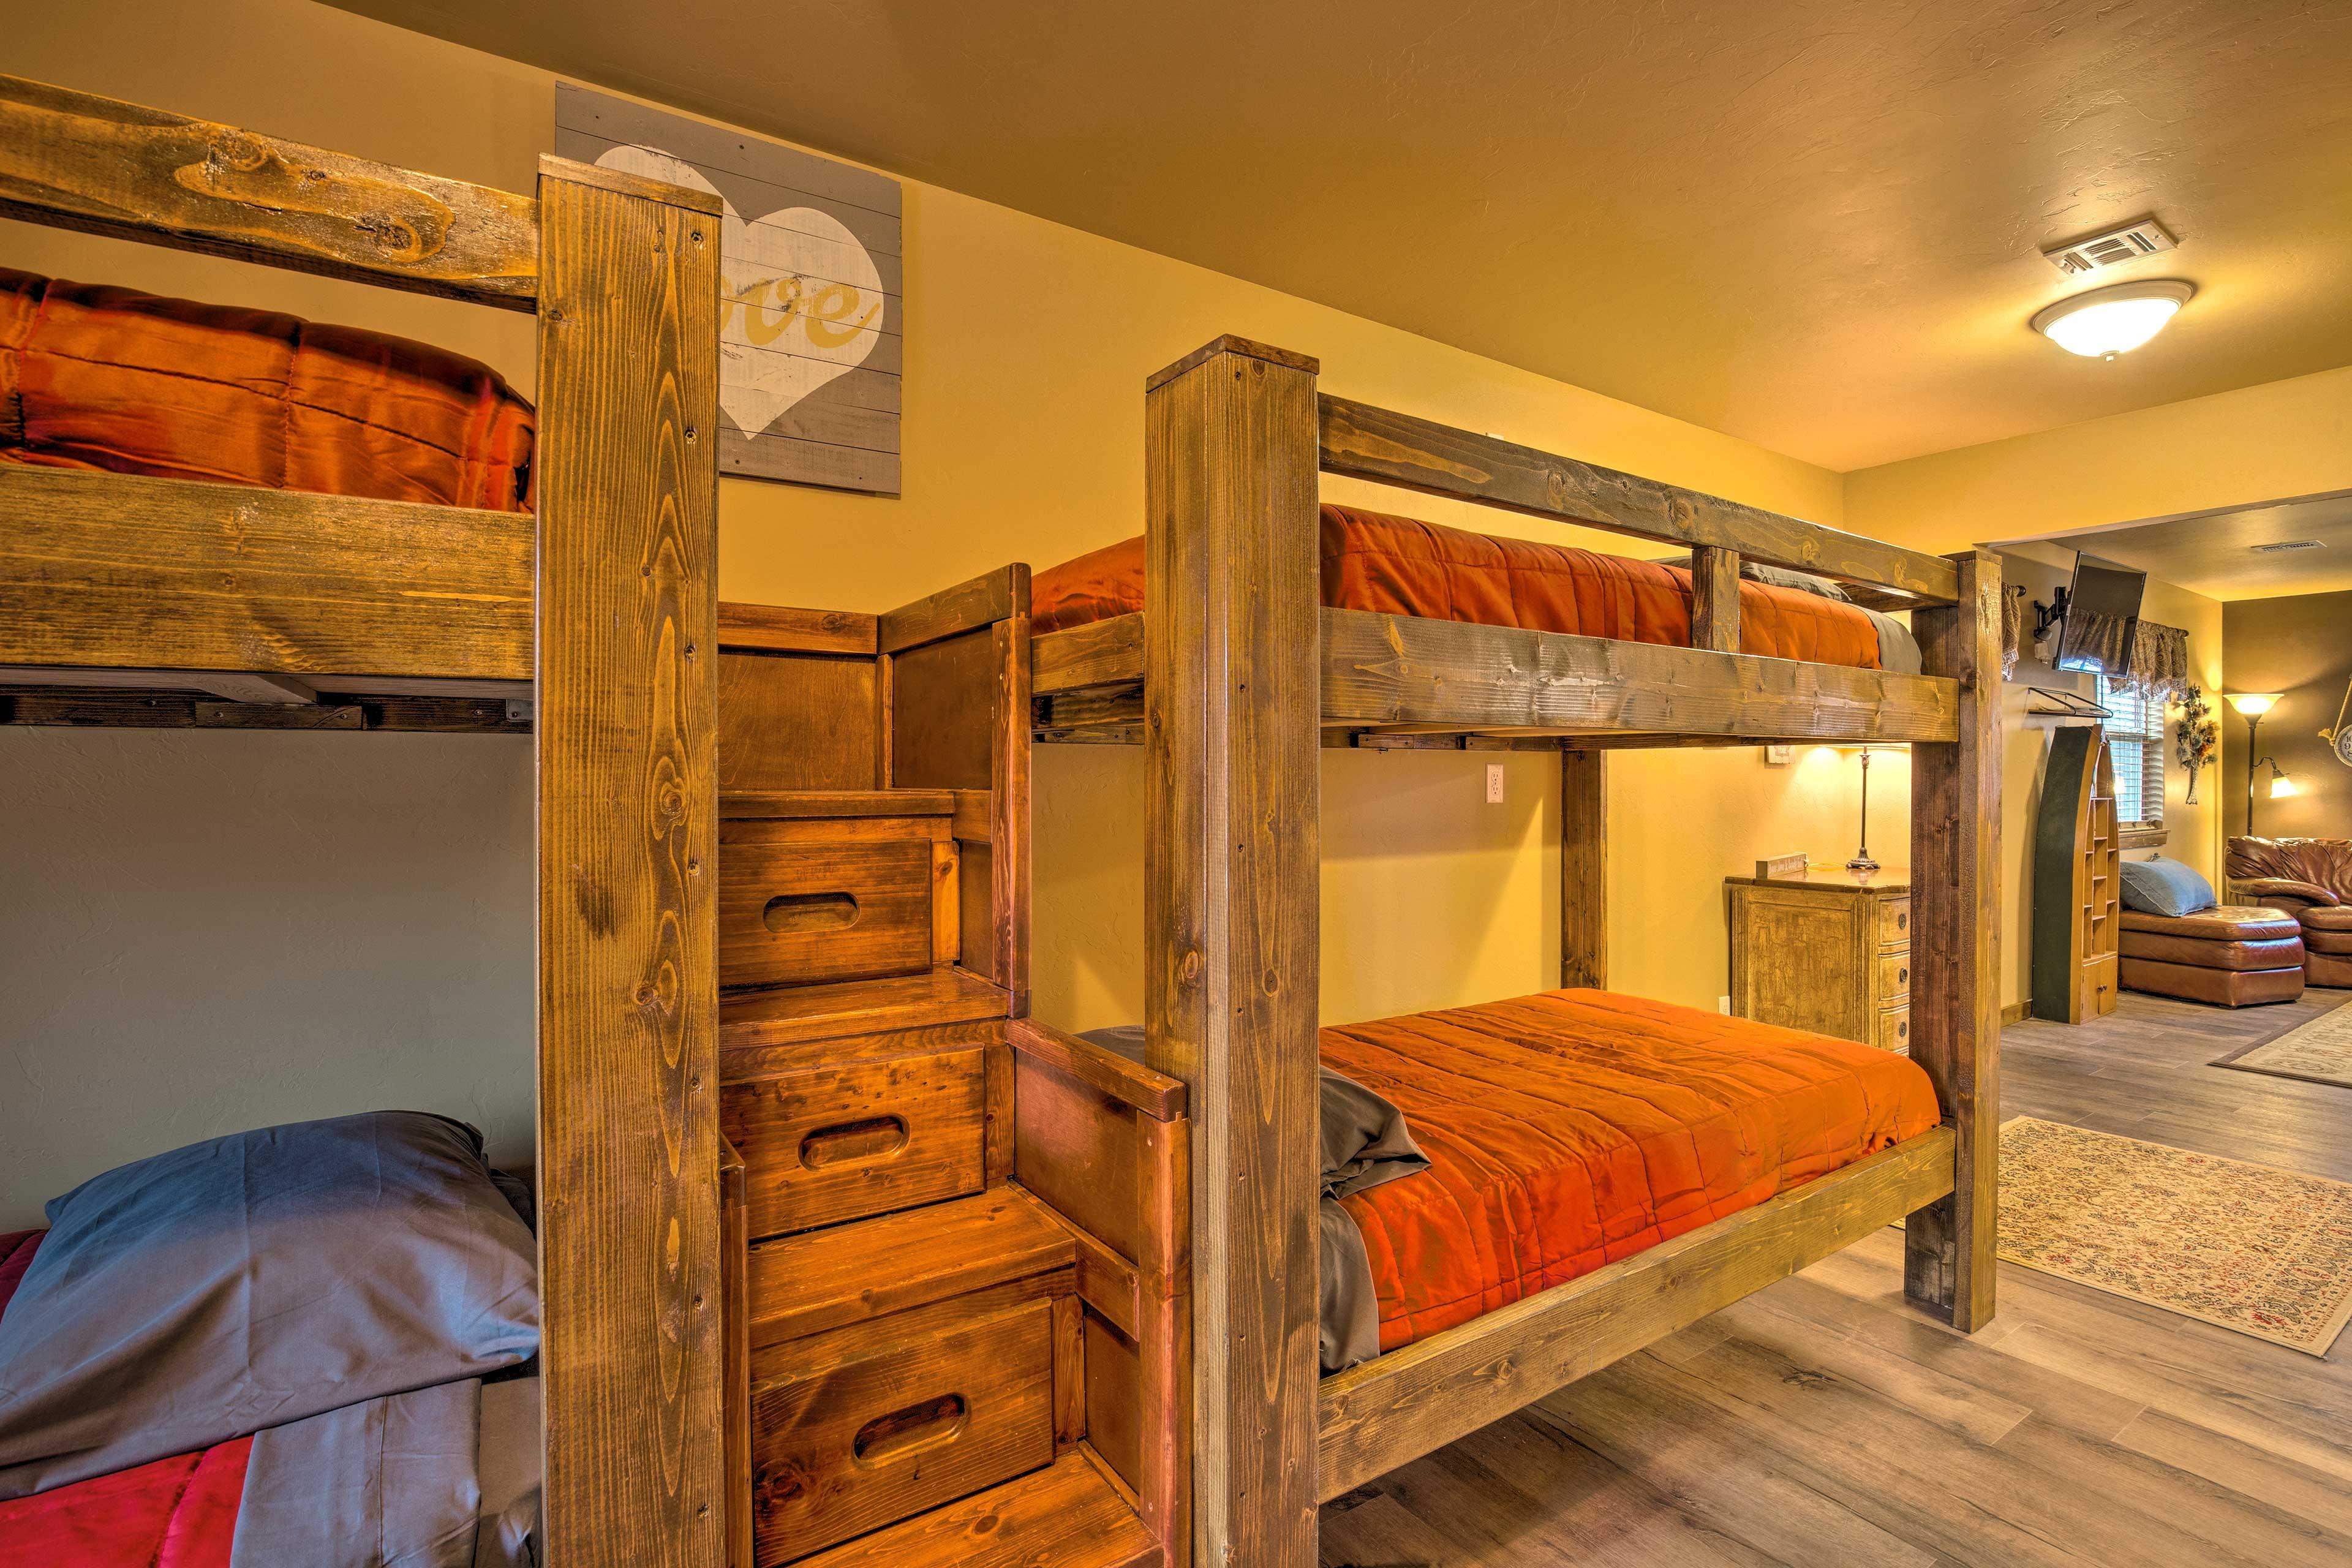 Who gets top bunk?